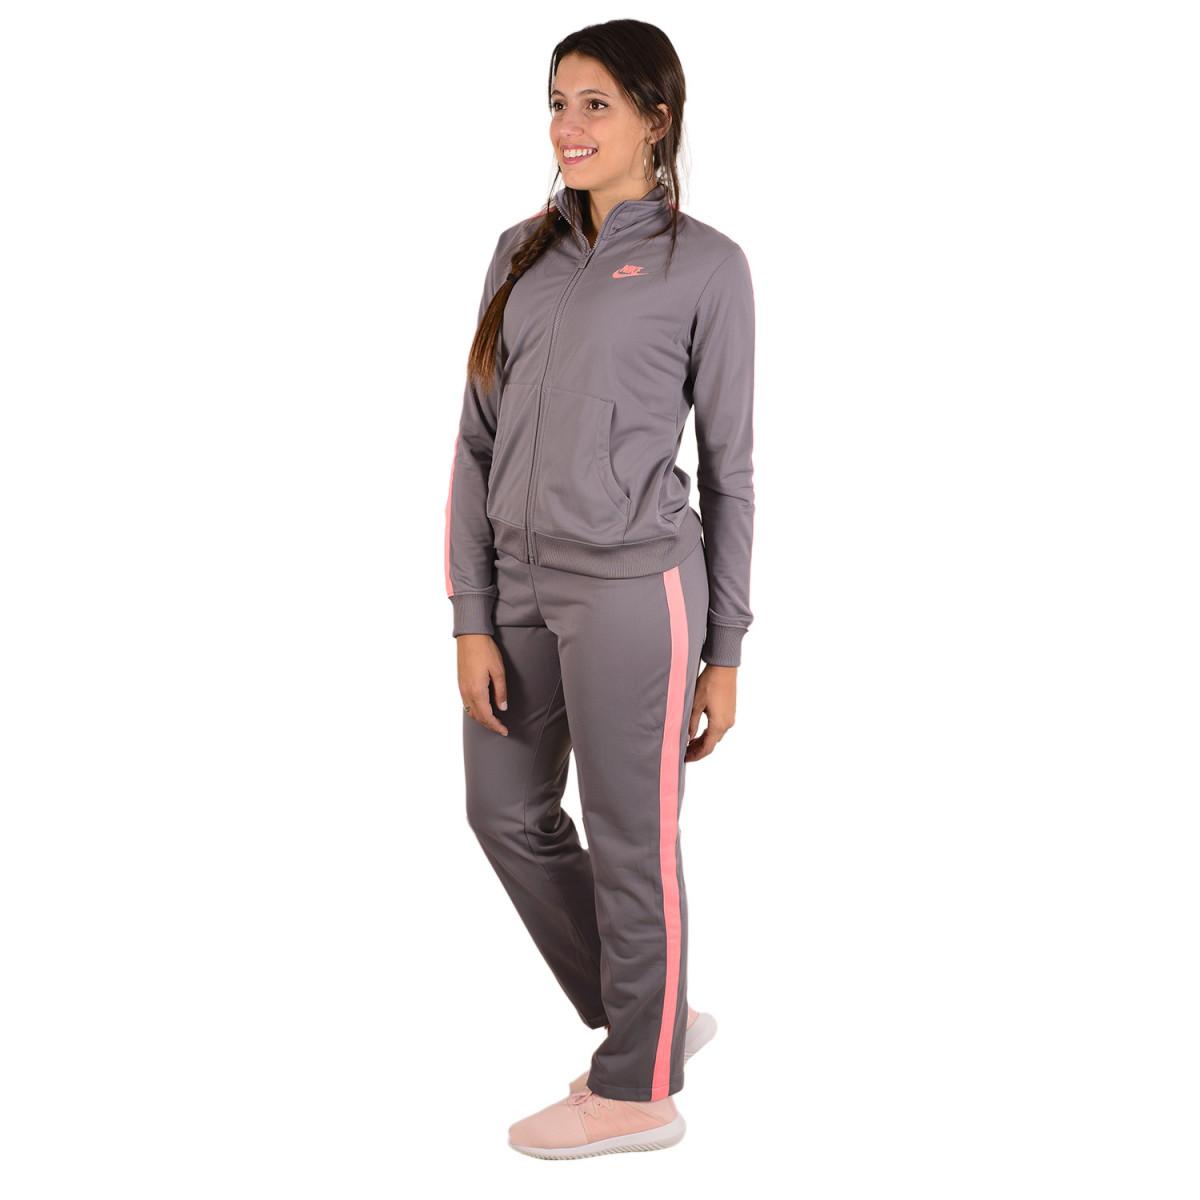 e59df65fc4daf Conjunto Nike Sportswear - Conjuntos Deportivos - Indumentaria - Mujer